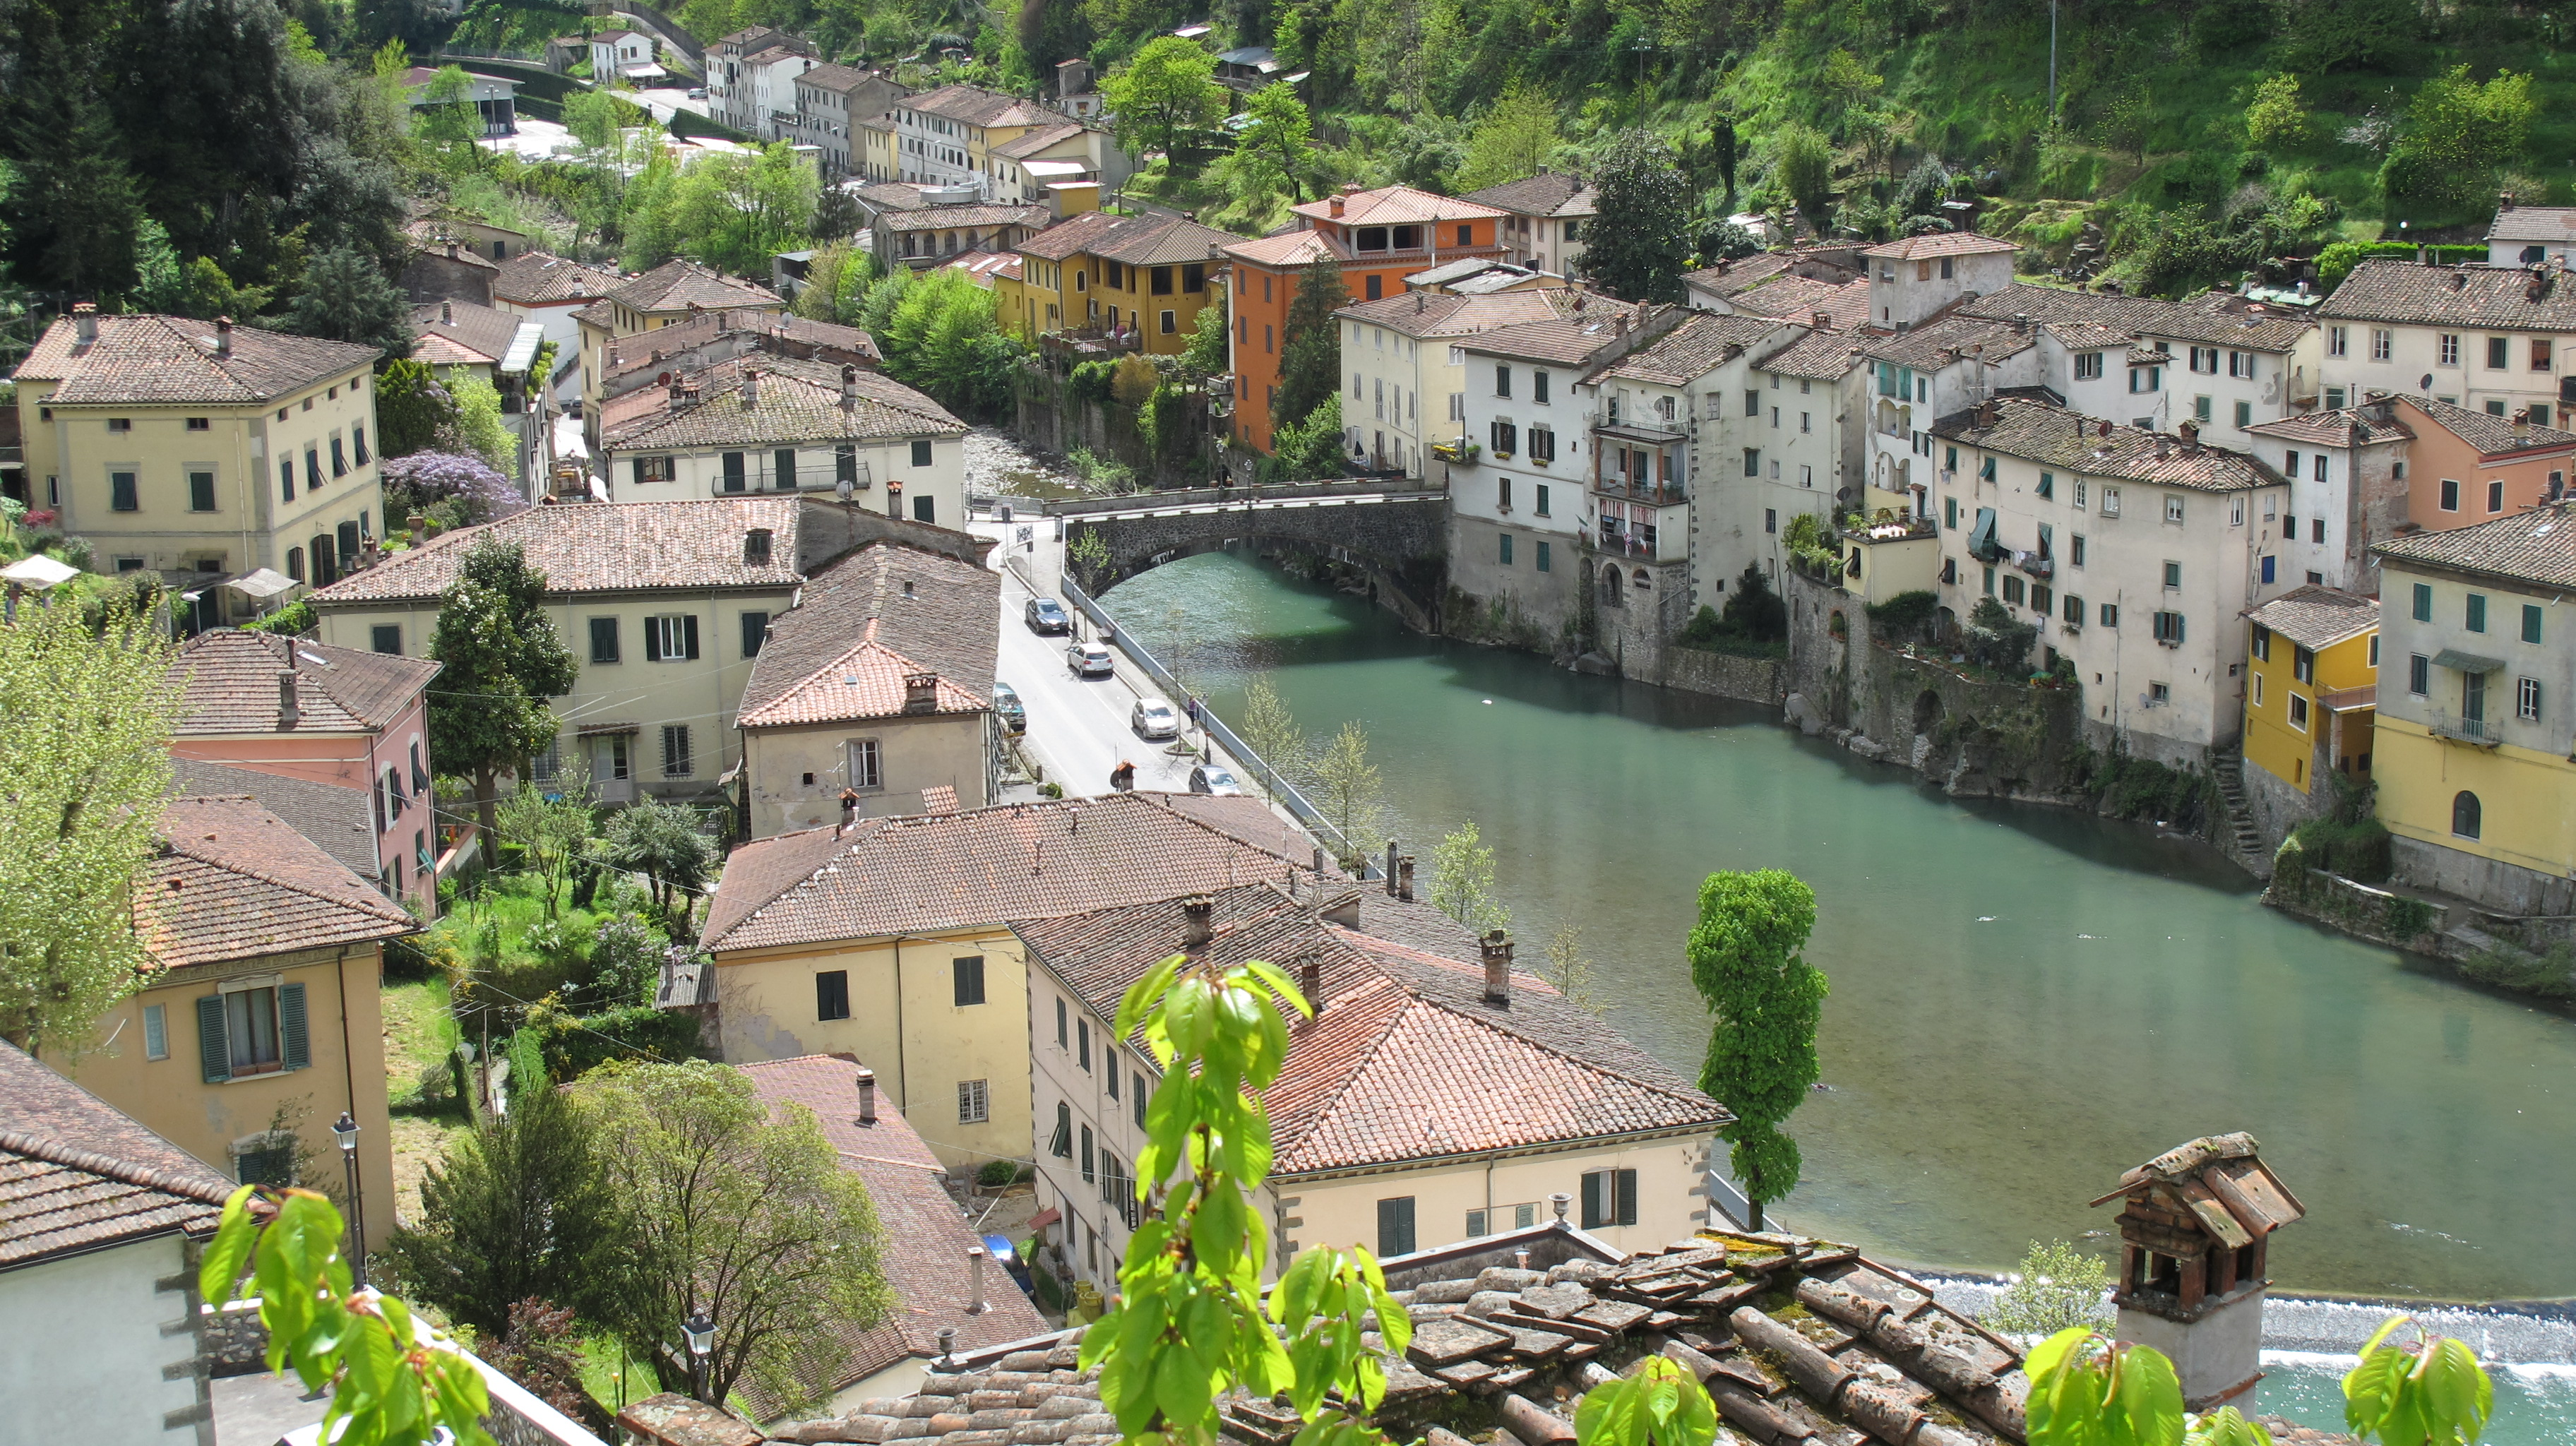 Ponte a Serraglio in April | Bagni di Lucca and Beyond